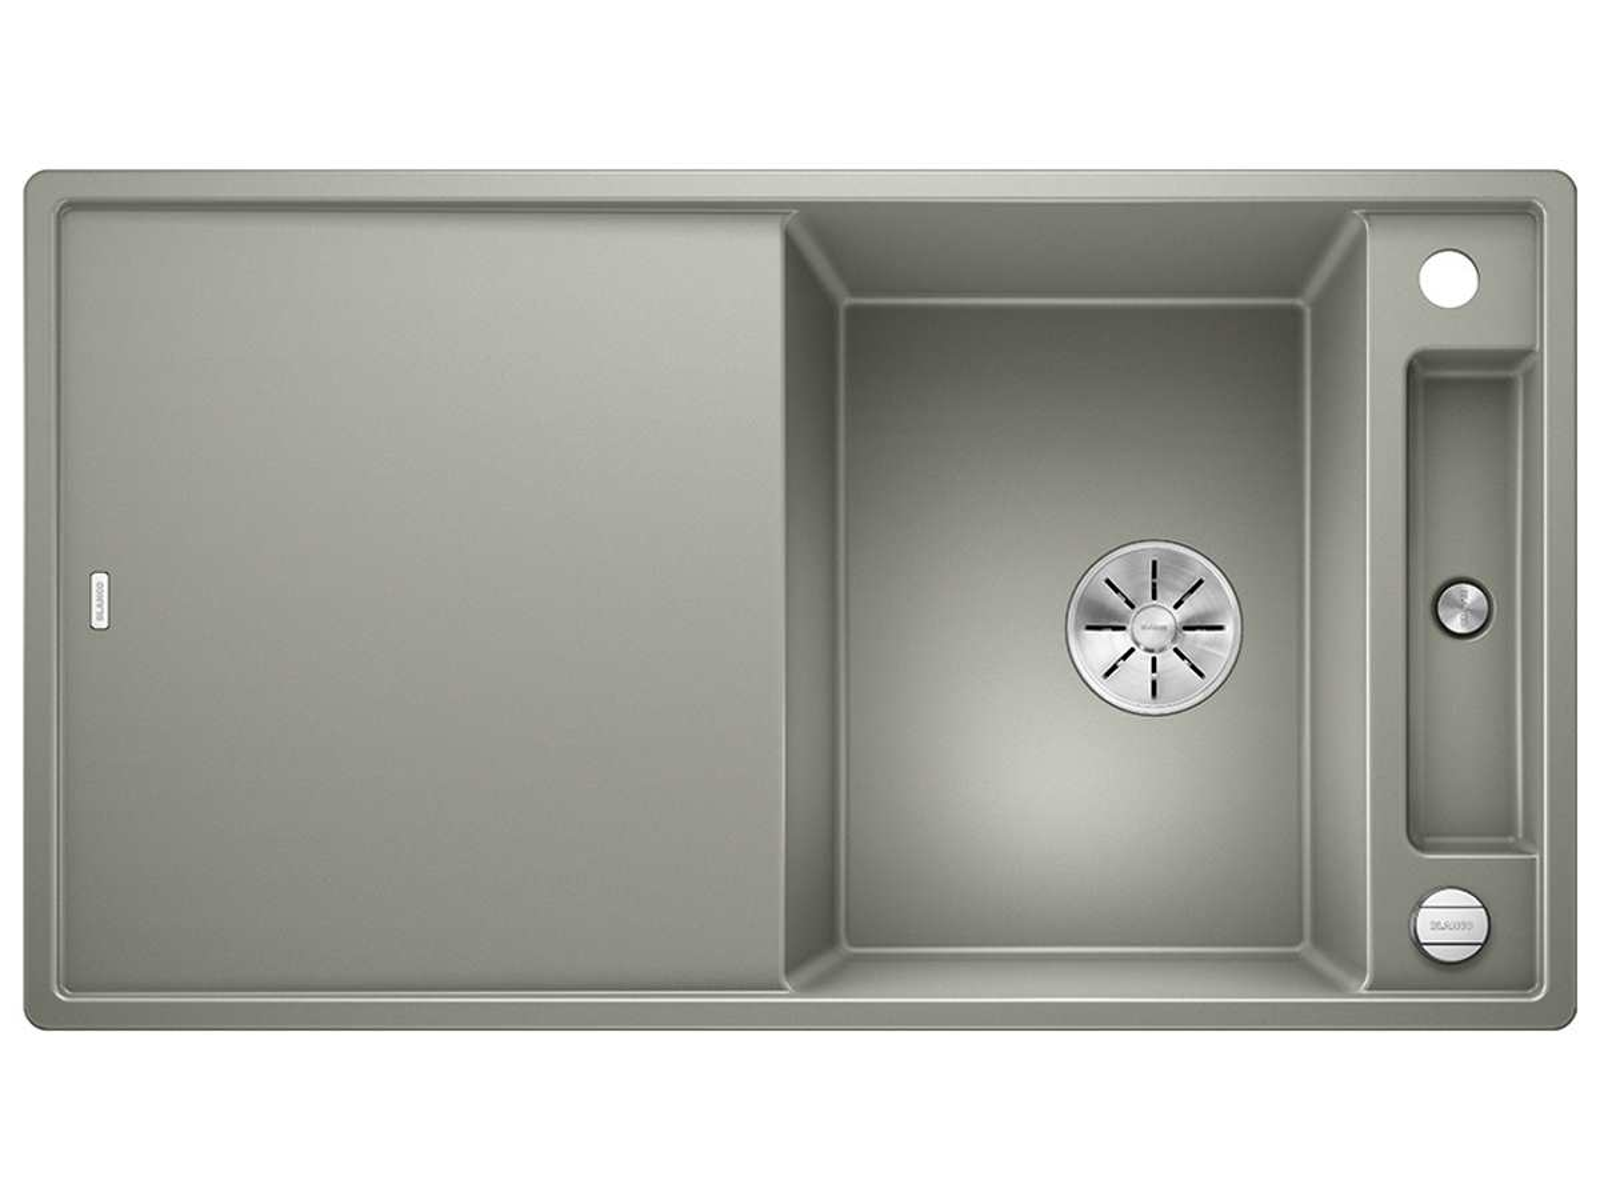 blanco axia iii 5 s perlgrau 523 208 granitsp le mit. Black Bedroom Furniture Sets. Home Design Ideas